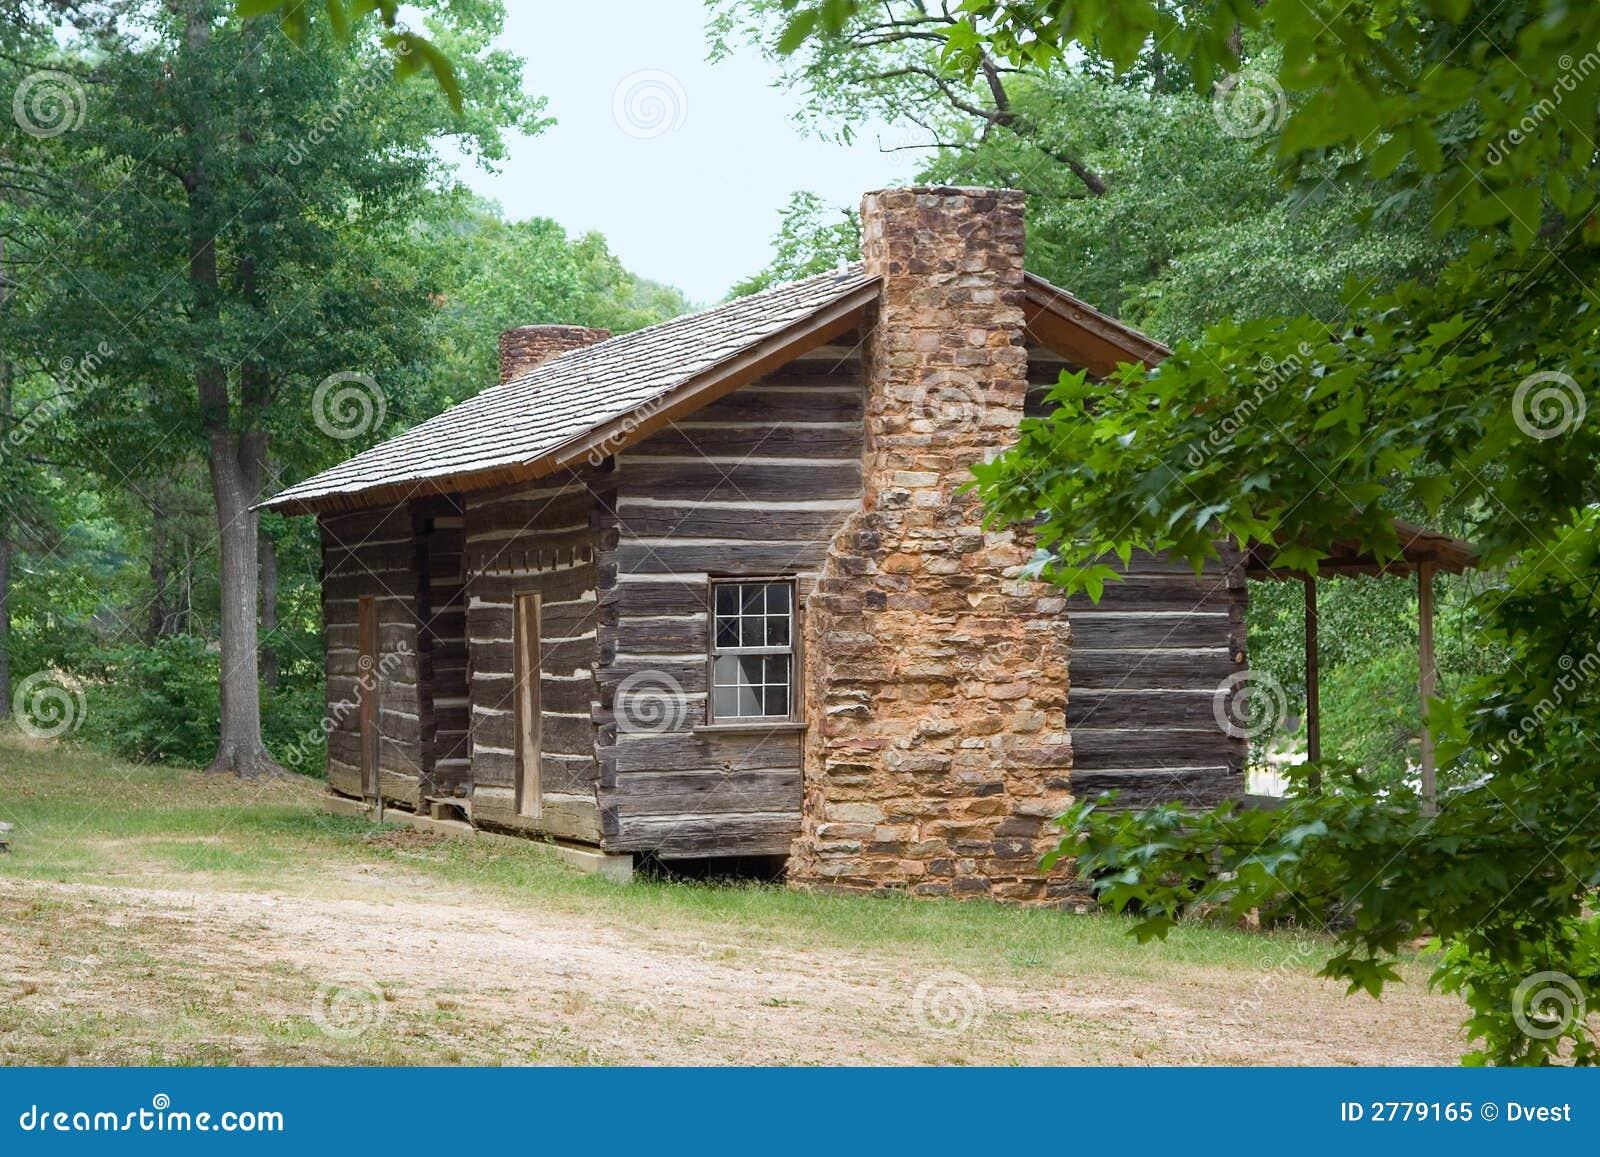 Log Cabin Royalty Free Stock Photo Image 2779165